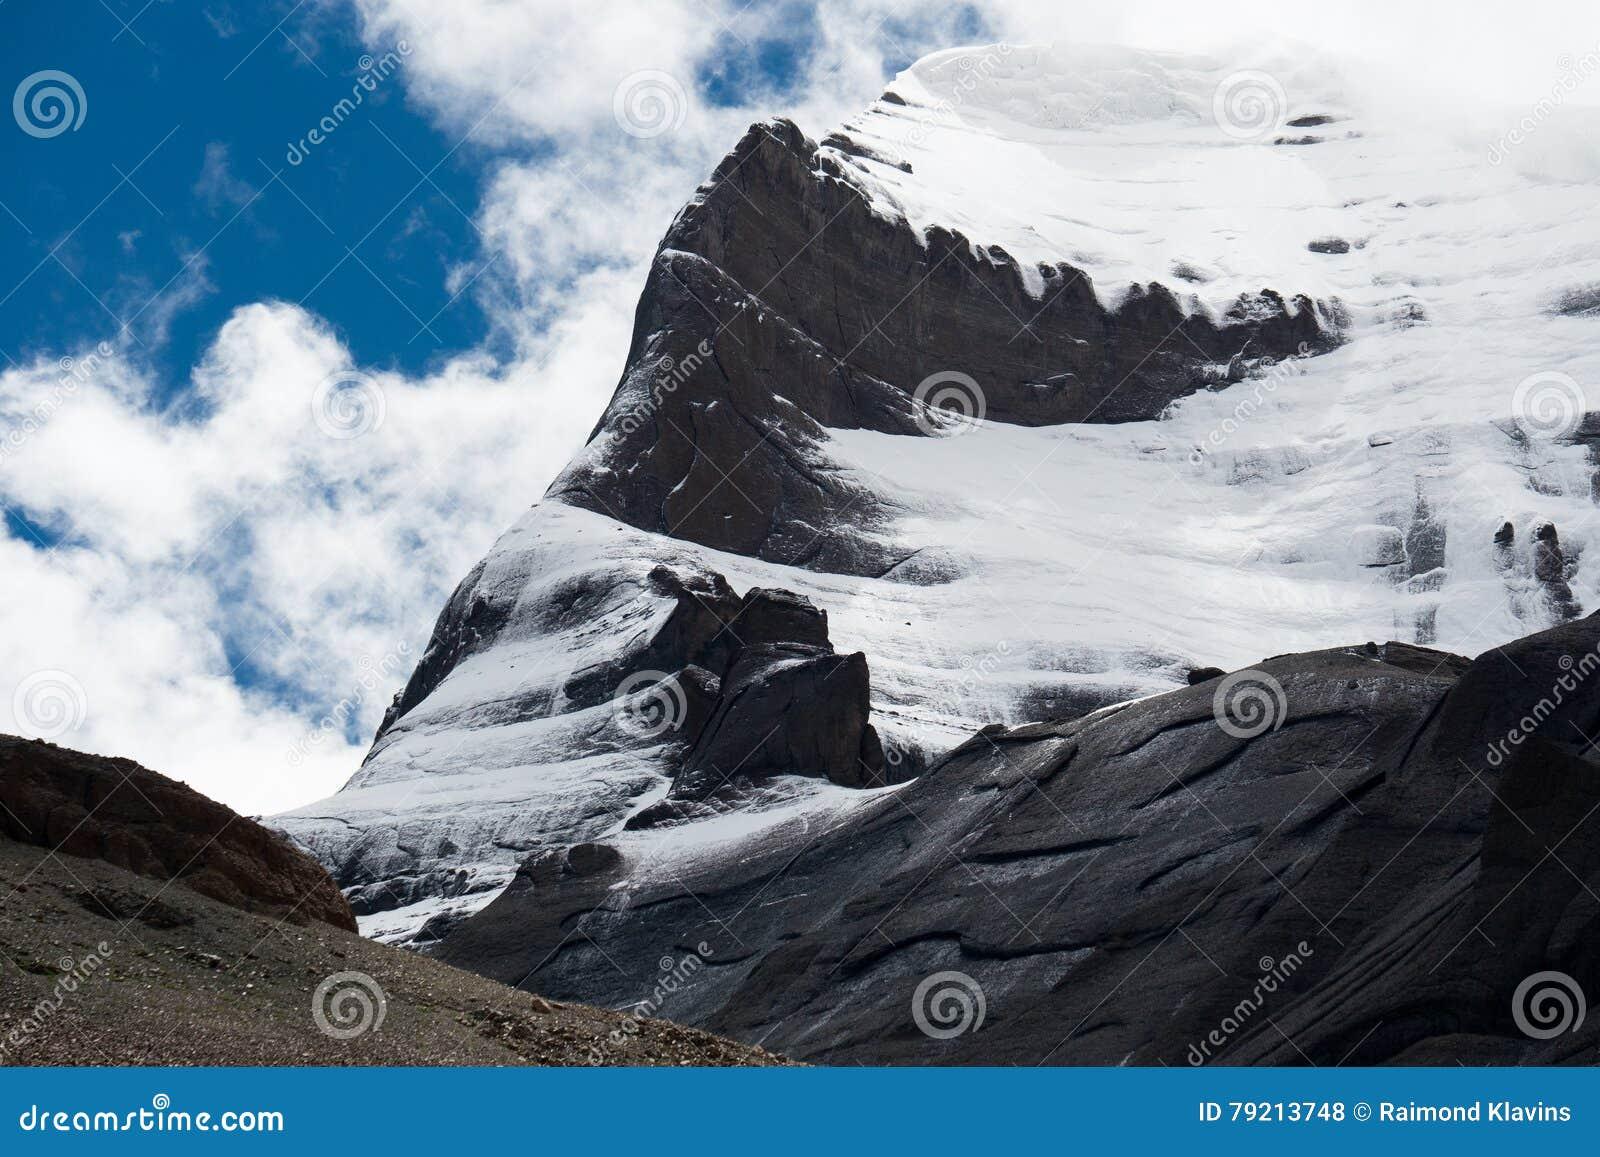 Kailas Himalayas Mountain Tibet Home Of The Lord Shiva Stock